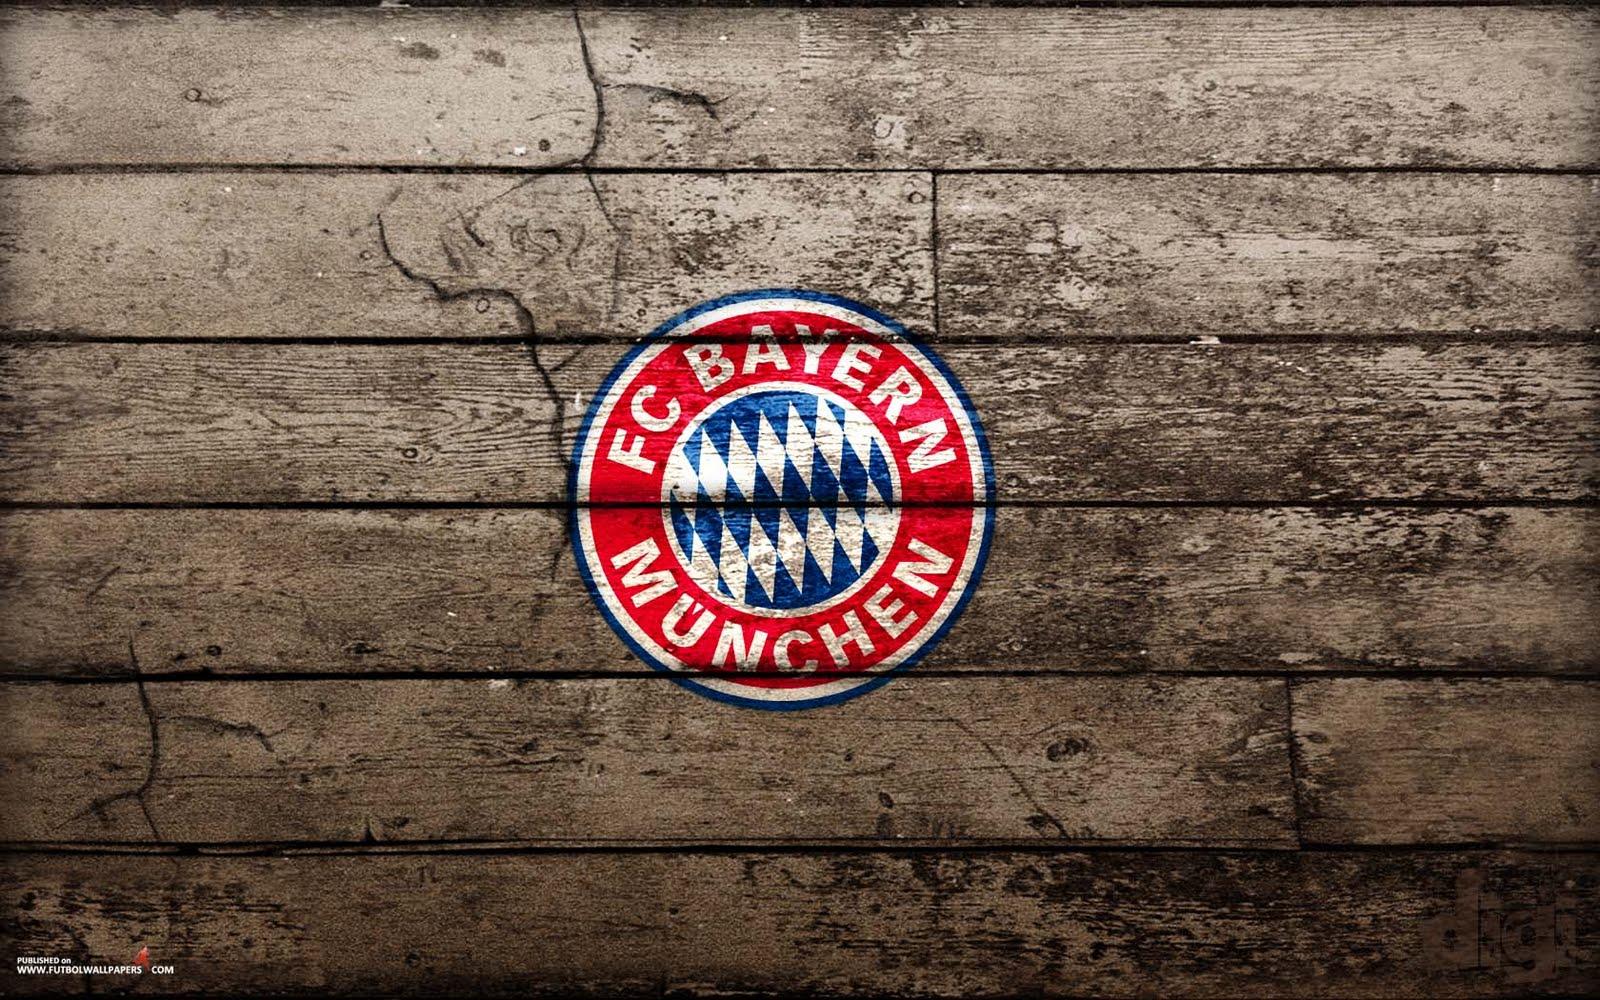 Bayern Munchen Football Club Wallpaper: FC Bayern Munich Wallpapers Photos HD